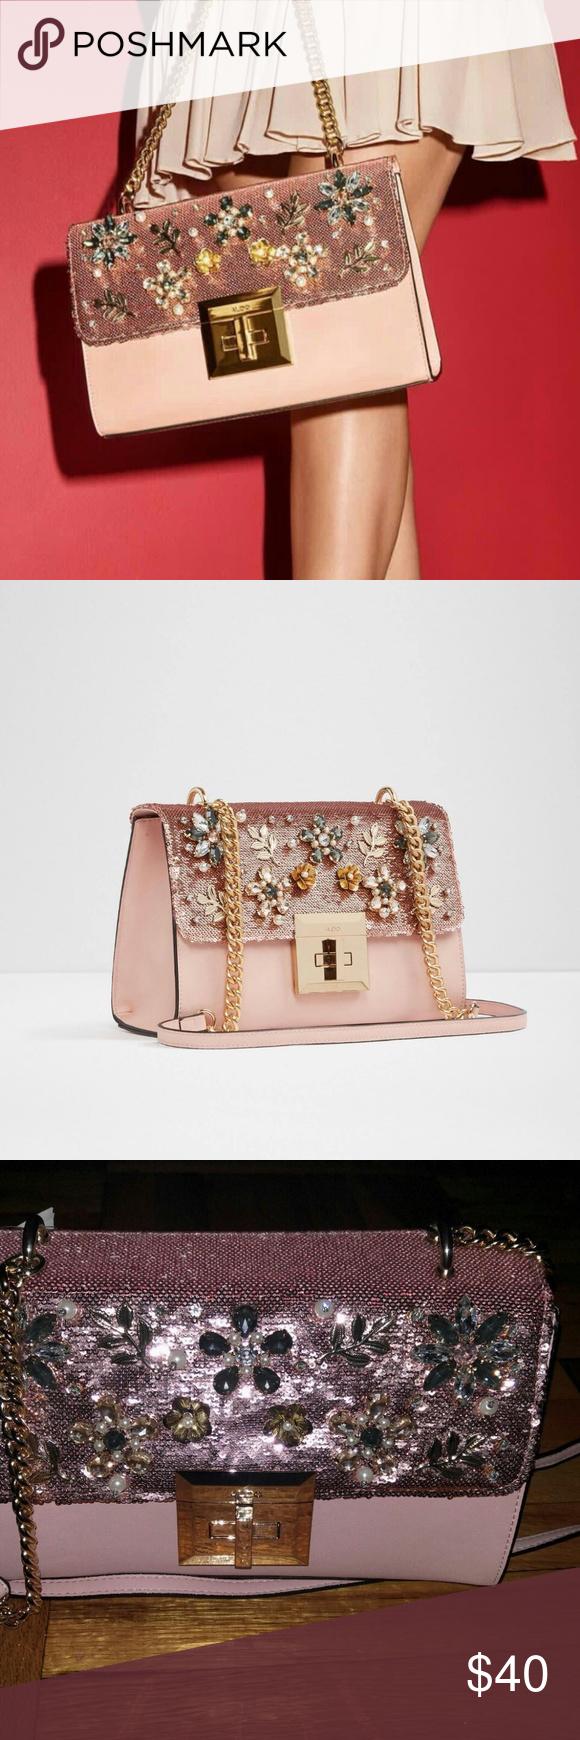 b3f8dbdcaf3 Aldo Light Pink Peach Derosia Crossbody Bag Very Beautiful Interior pocket  Faux Leather Secure clasp fastening ALDO Bags Crossbody Bags